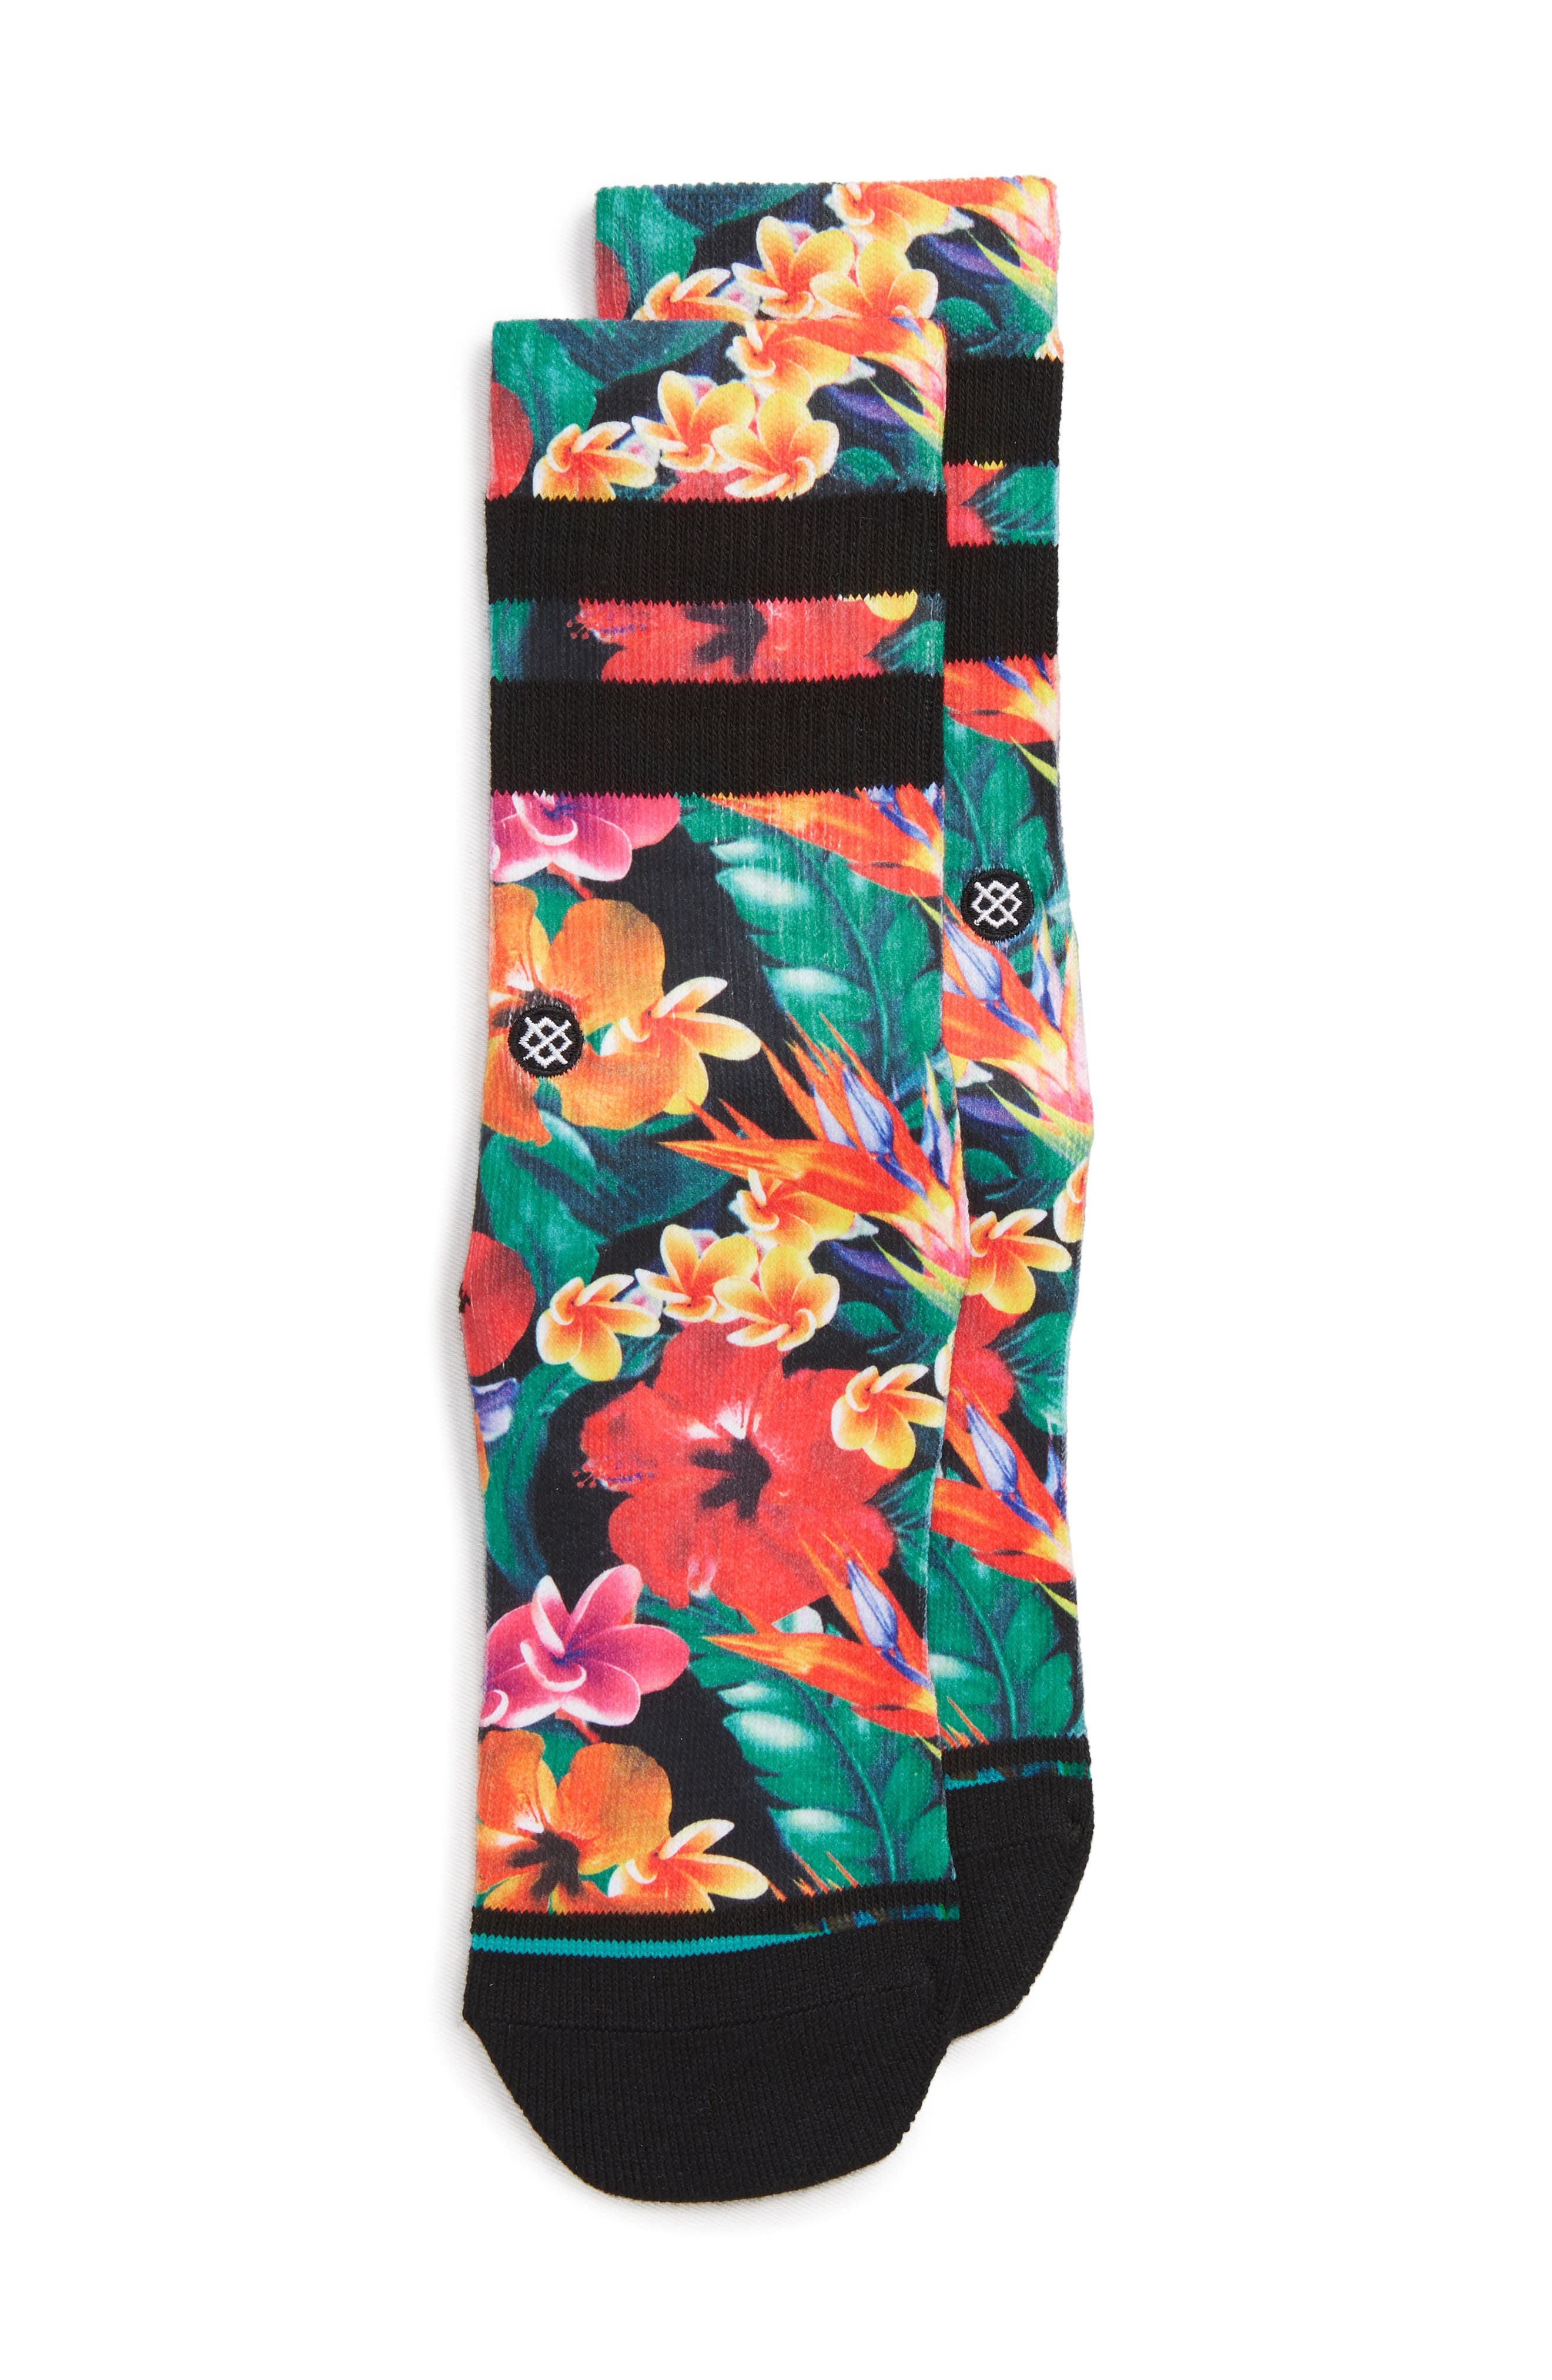 Pau Floral Socks,                             Main thumbnail 1, color,                             300